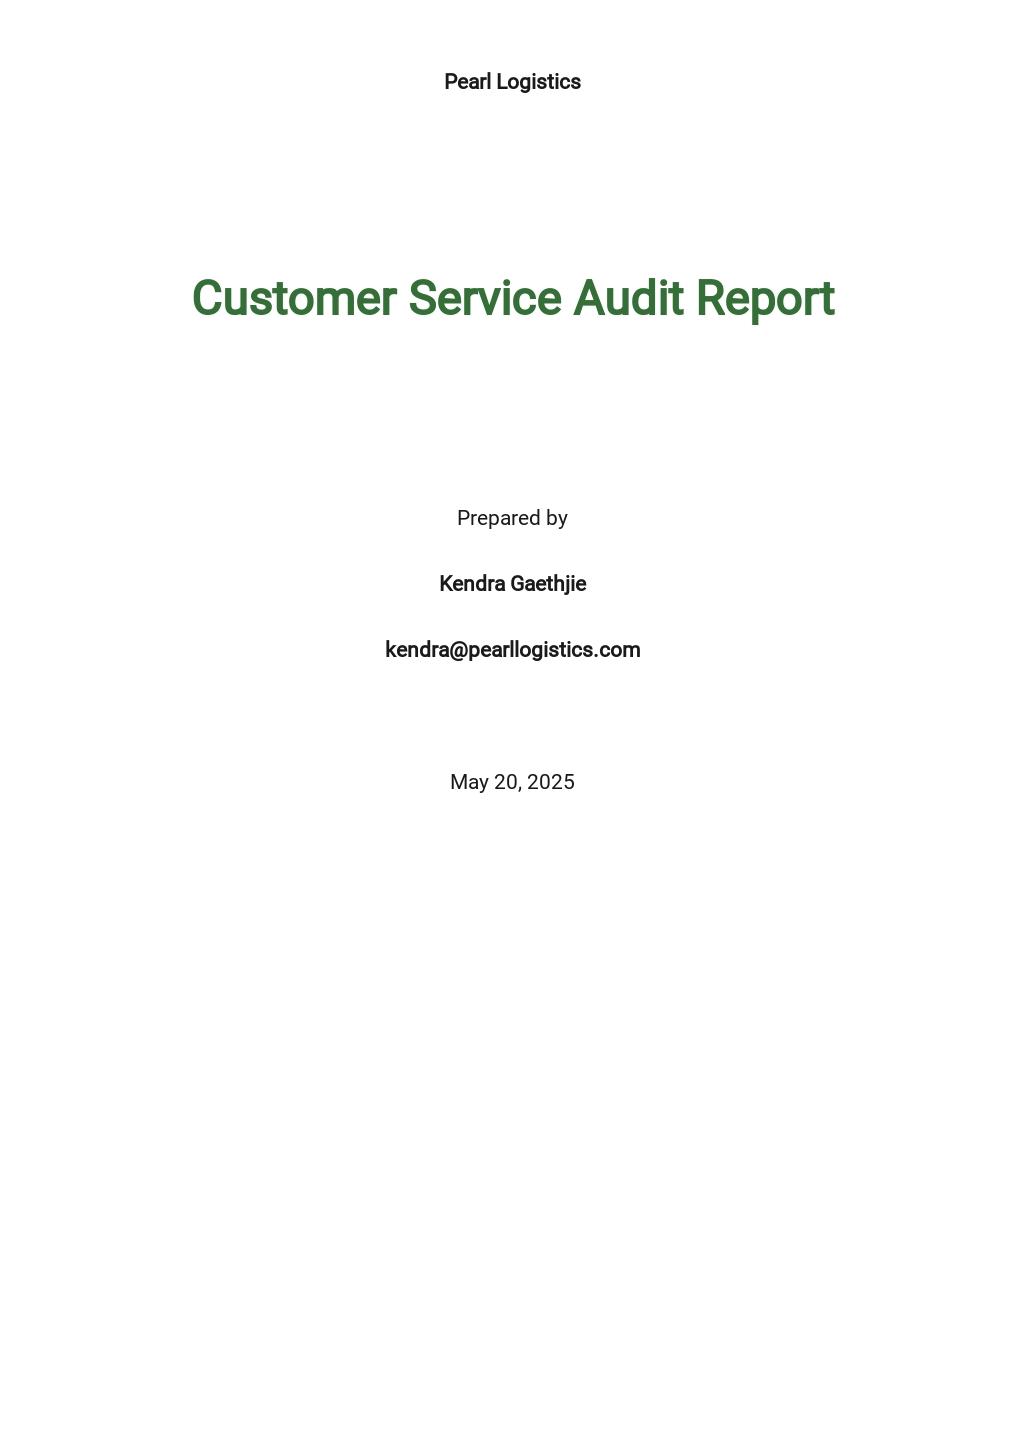 Customer Service Audit Report Template